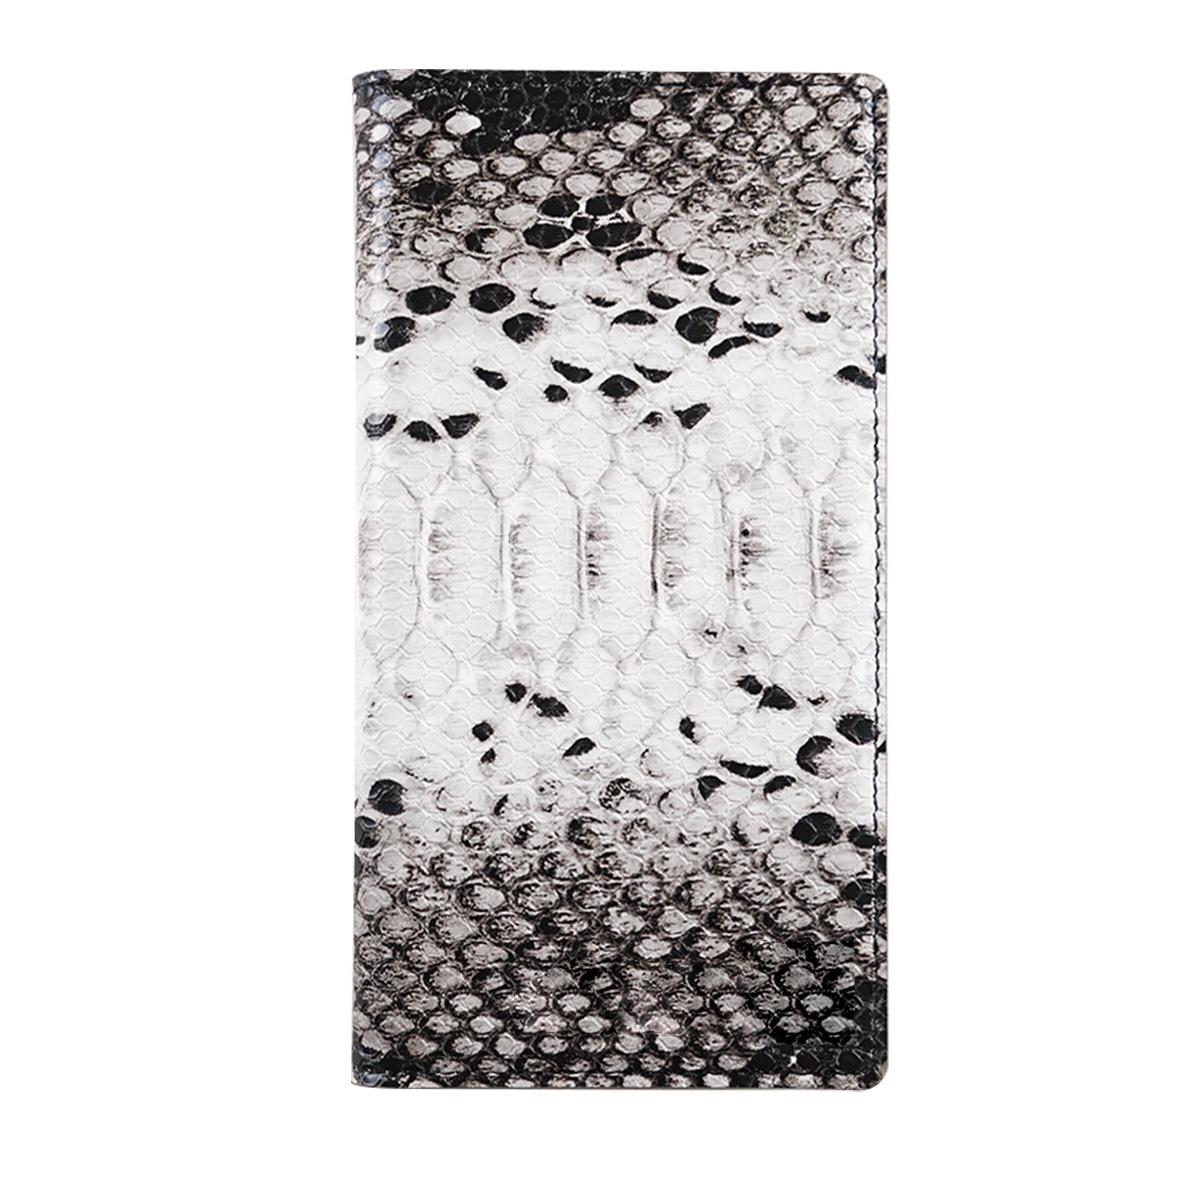 Xperia XZ1 ケース 手帳型 GAZE Mods Snake Diary(ゲイズ モッズスネイクダイアリー)エクスペリア エックスゼットワン カバー SO-01K SOV36 701SO